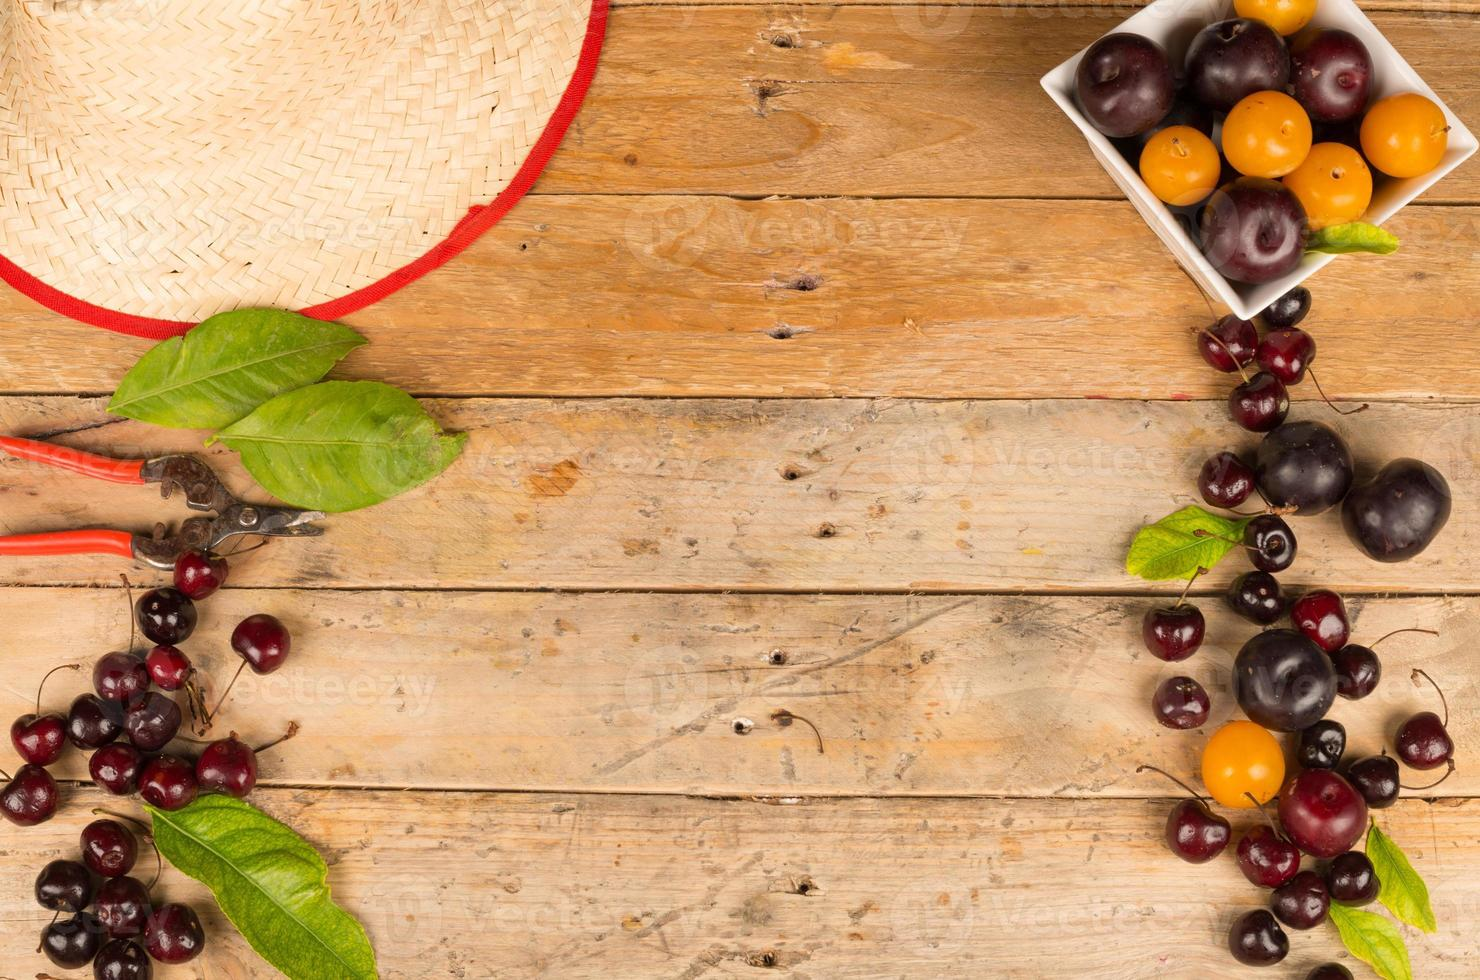 Summer produce photo